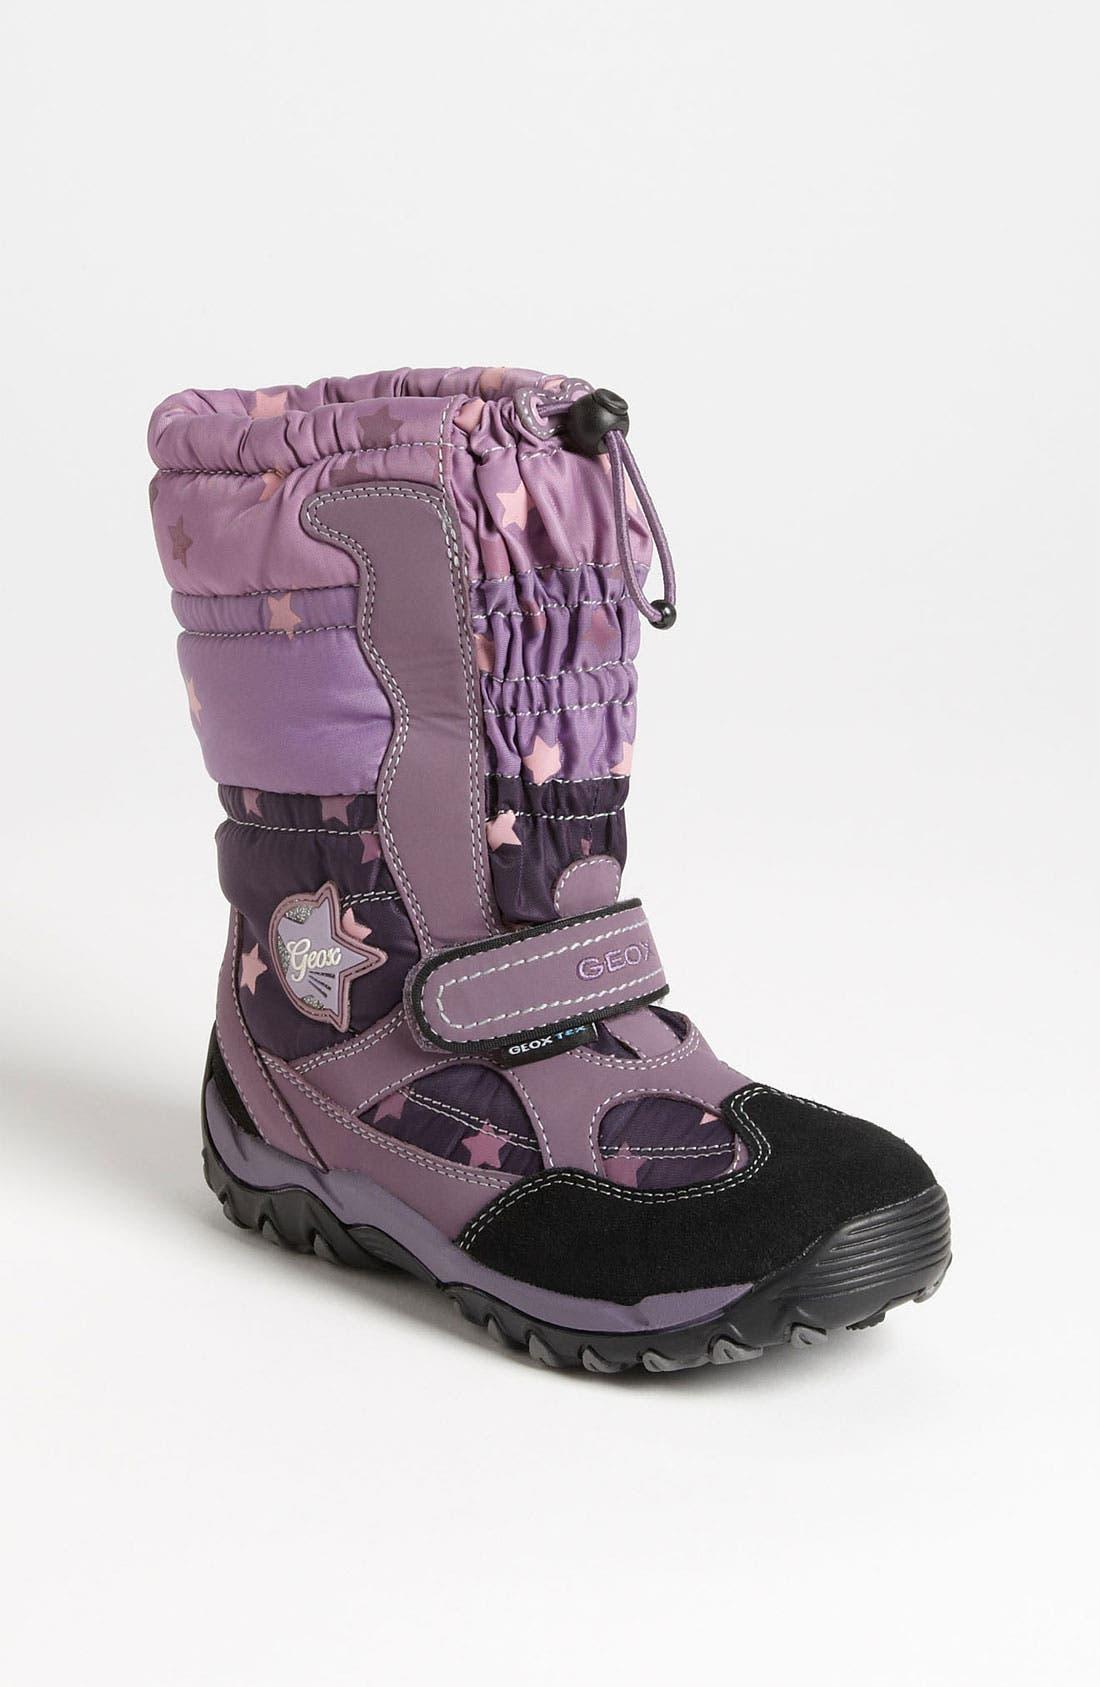 Main Image - Geox 'Alaska' Boot (Toddler, Little Kid & Big Kid)